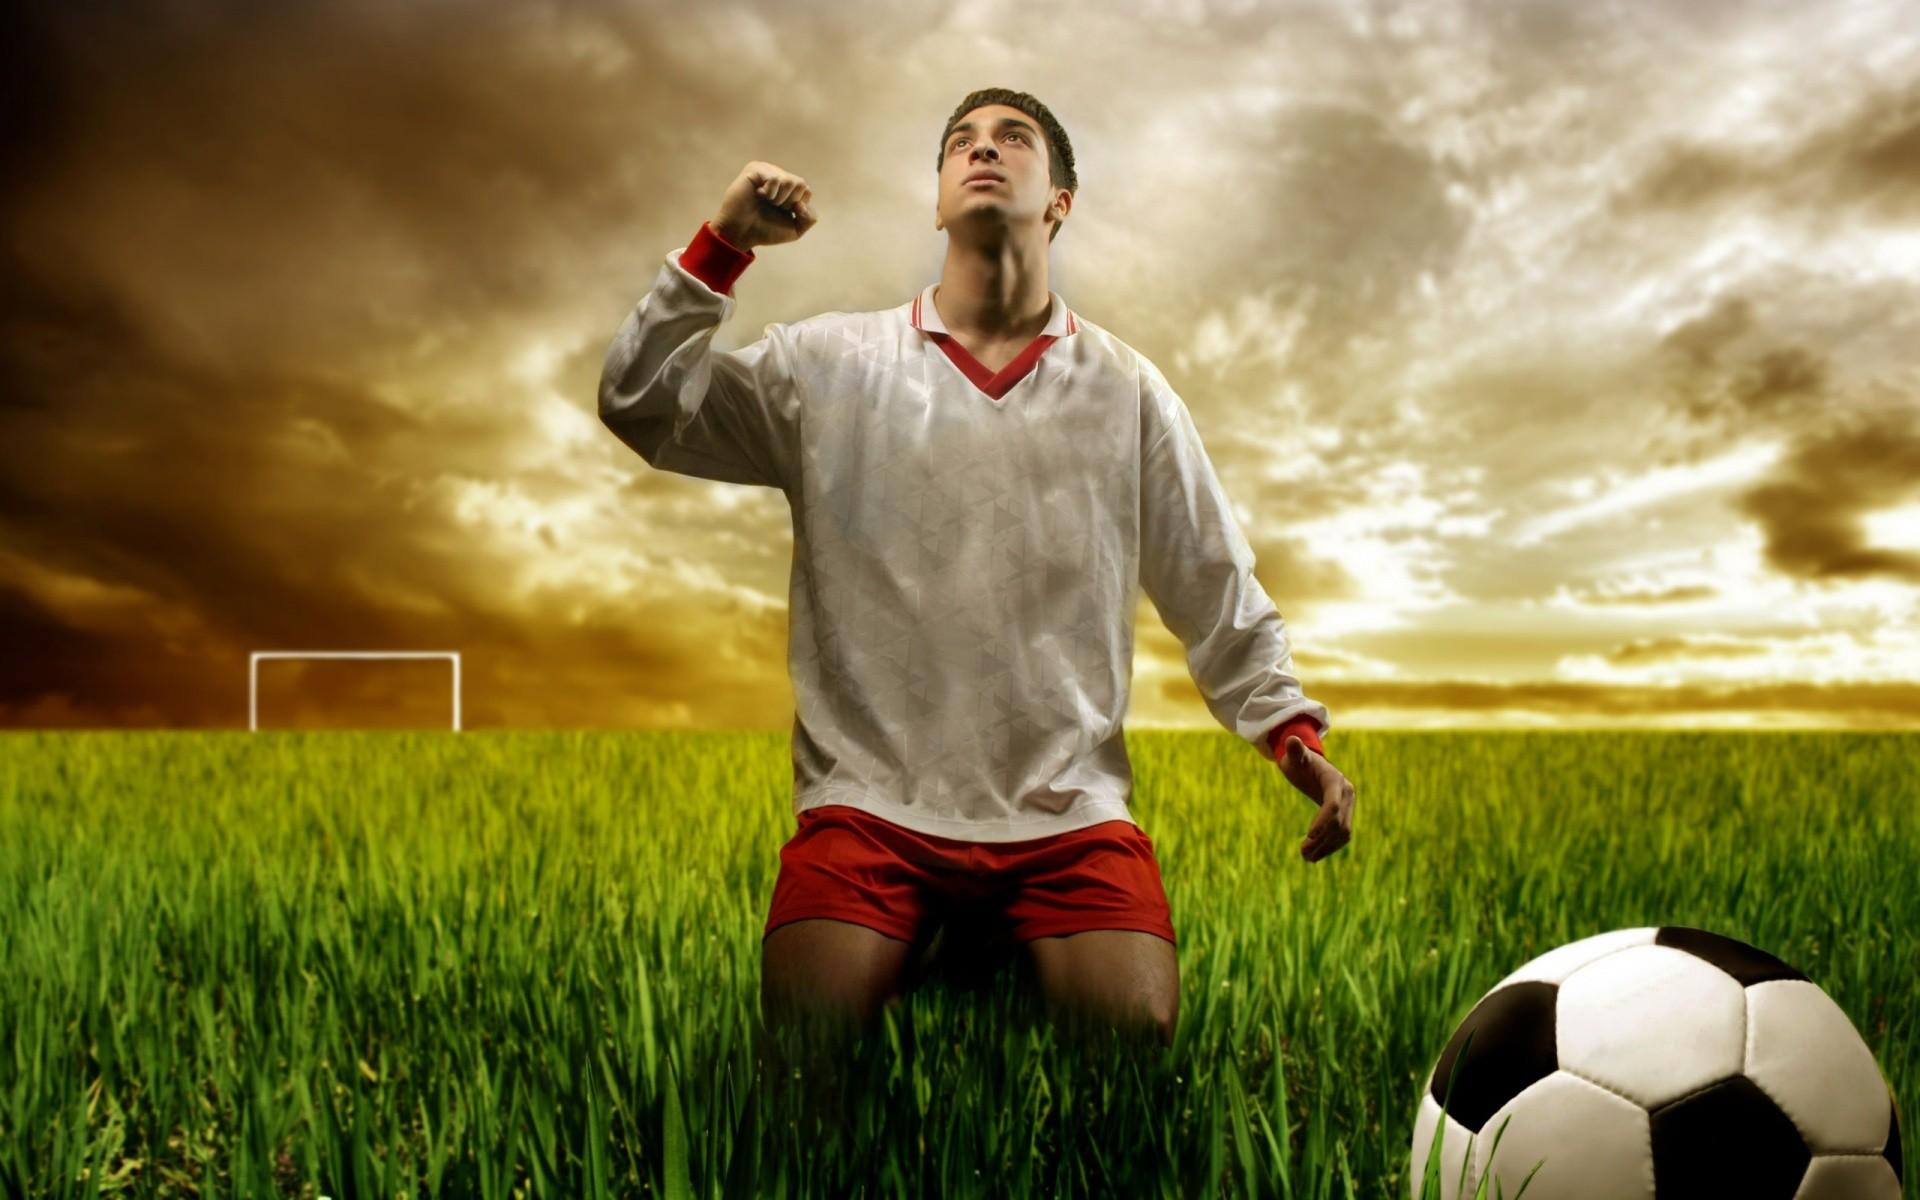 Previous: Football player …